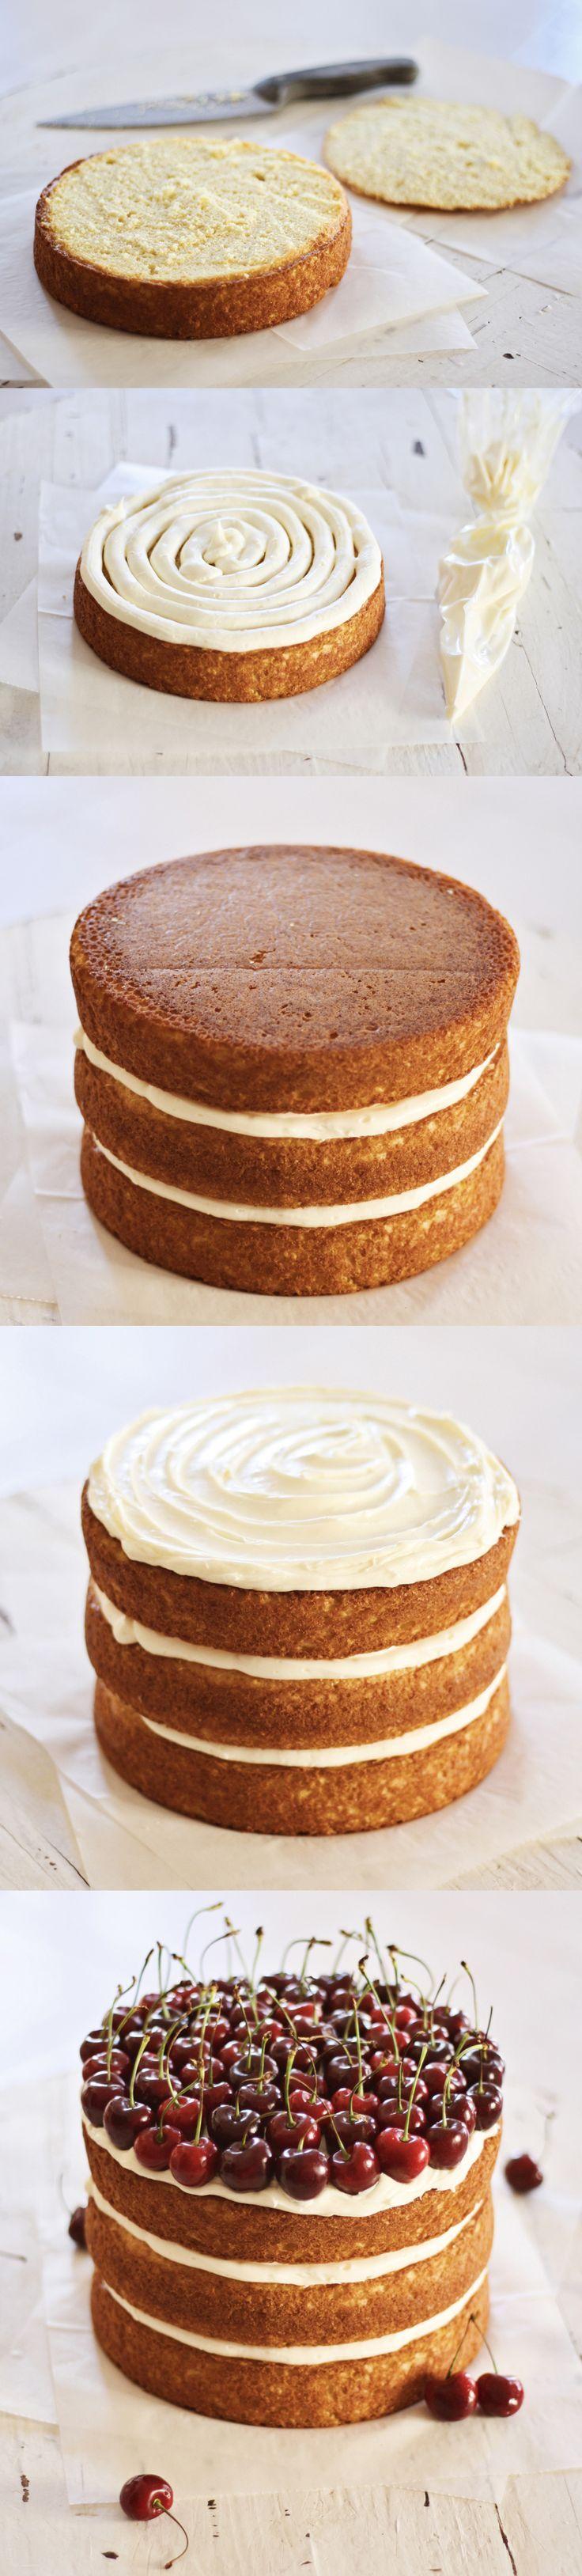 How To Make A Naked Cake | Baked By Joanna via Kristi Murphy